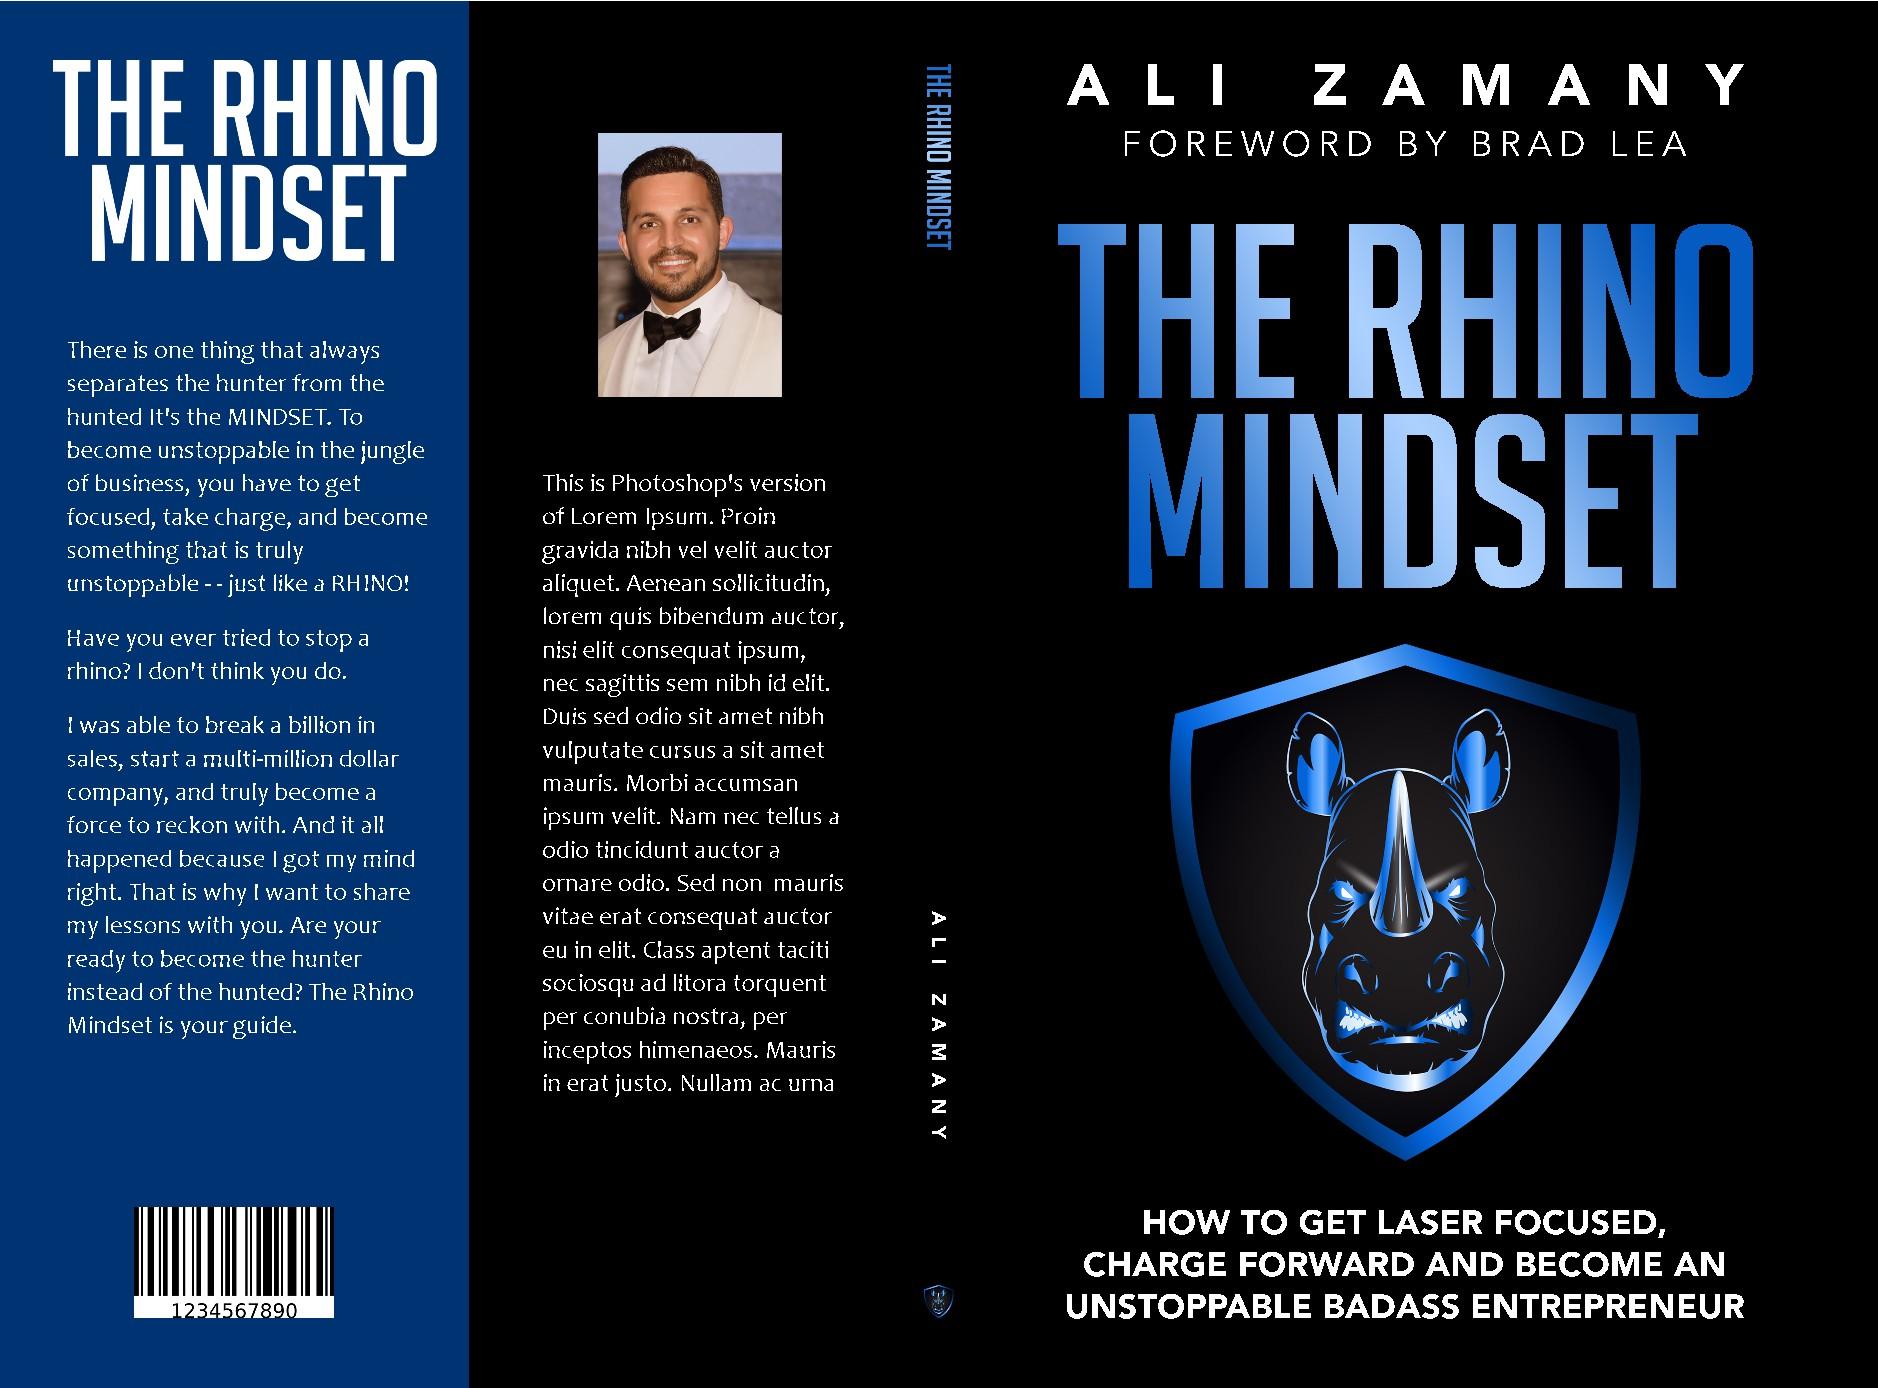 THE RHINO MINDSET book🦏 🦏 🦏